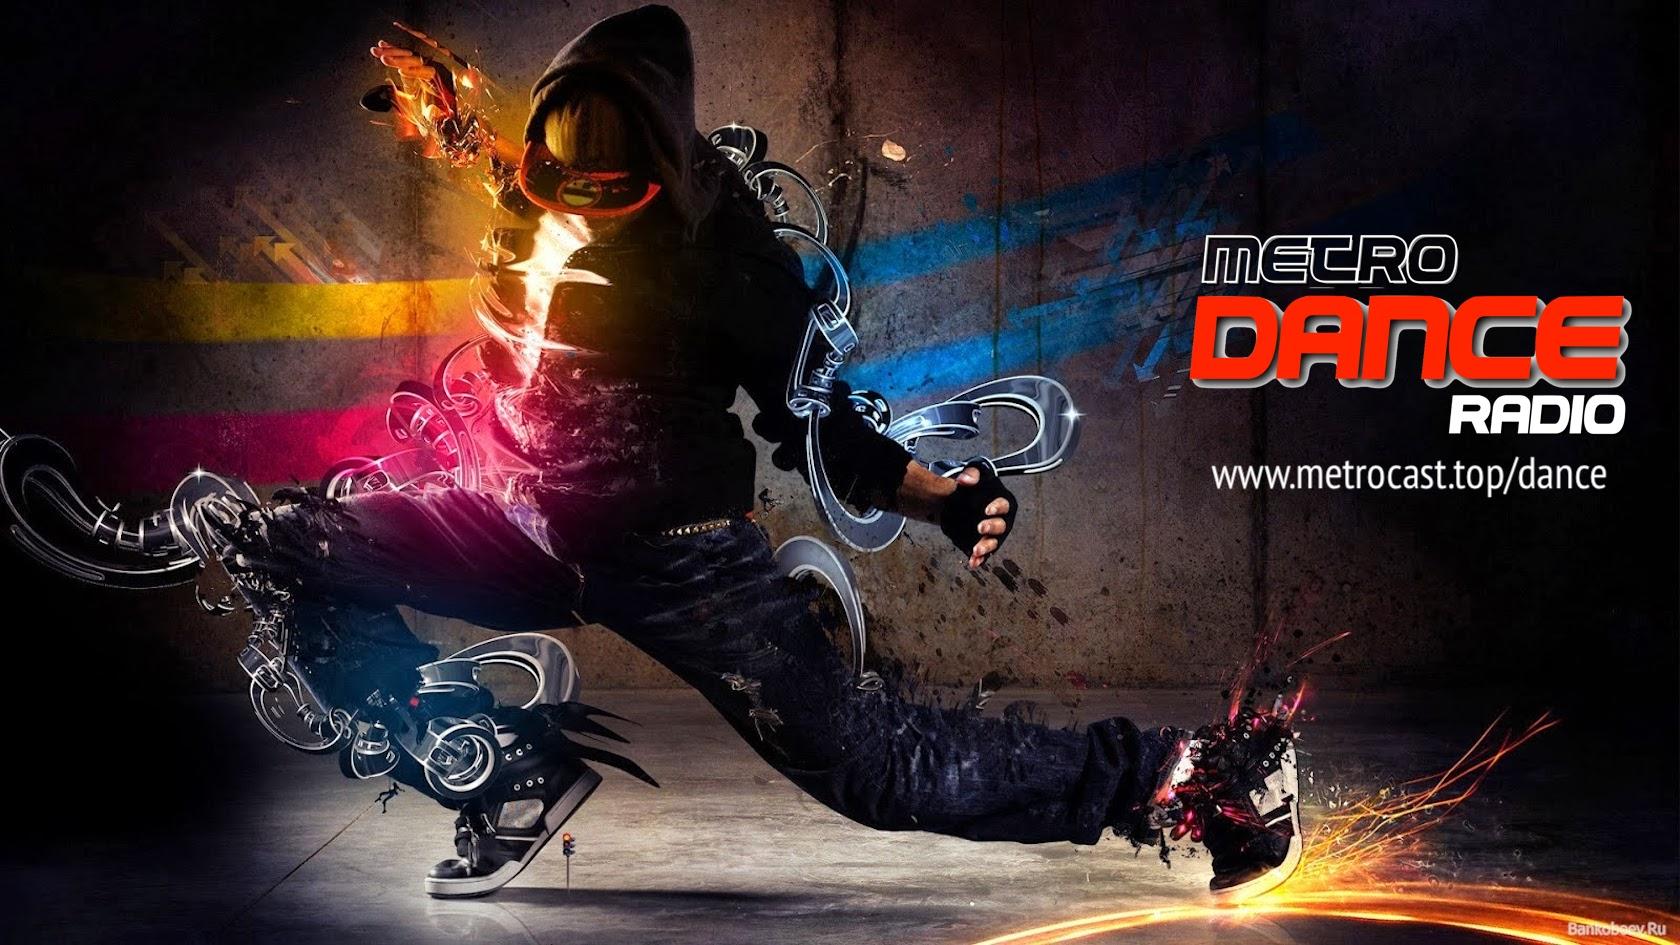 MetroDance Radio Online